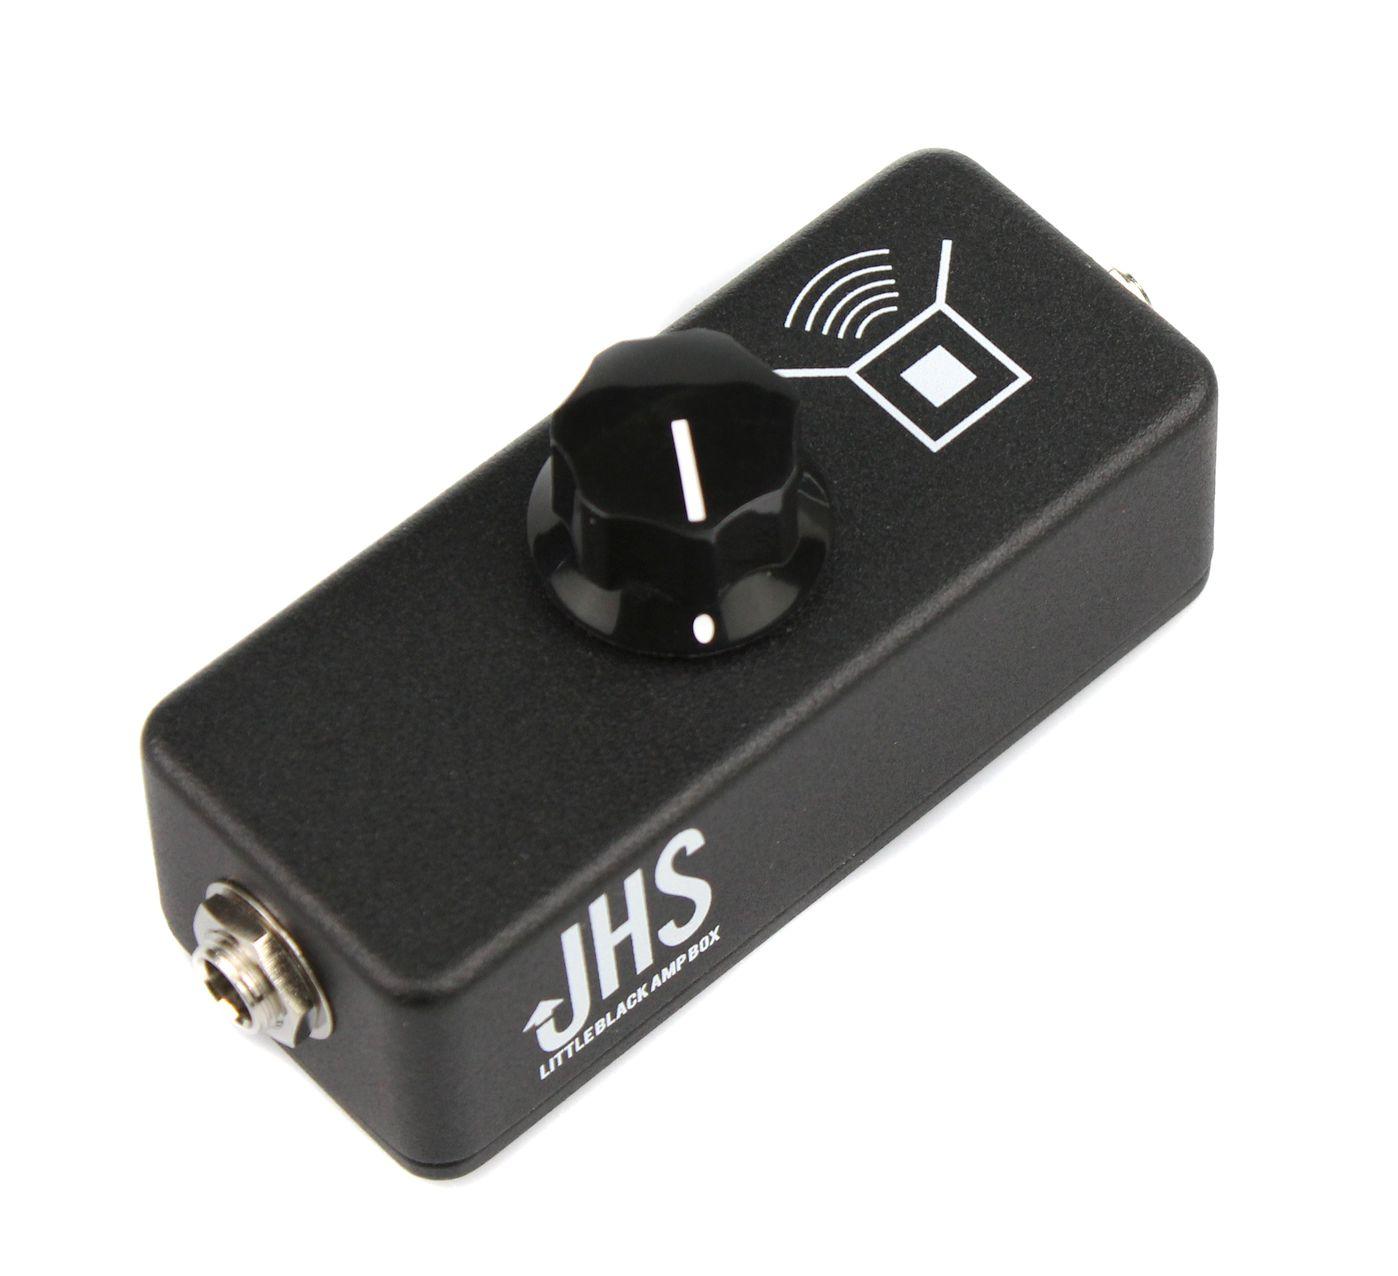 JHS-Pedals-Little-Black-Amp-Box-side